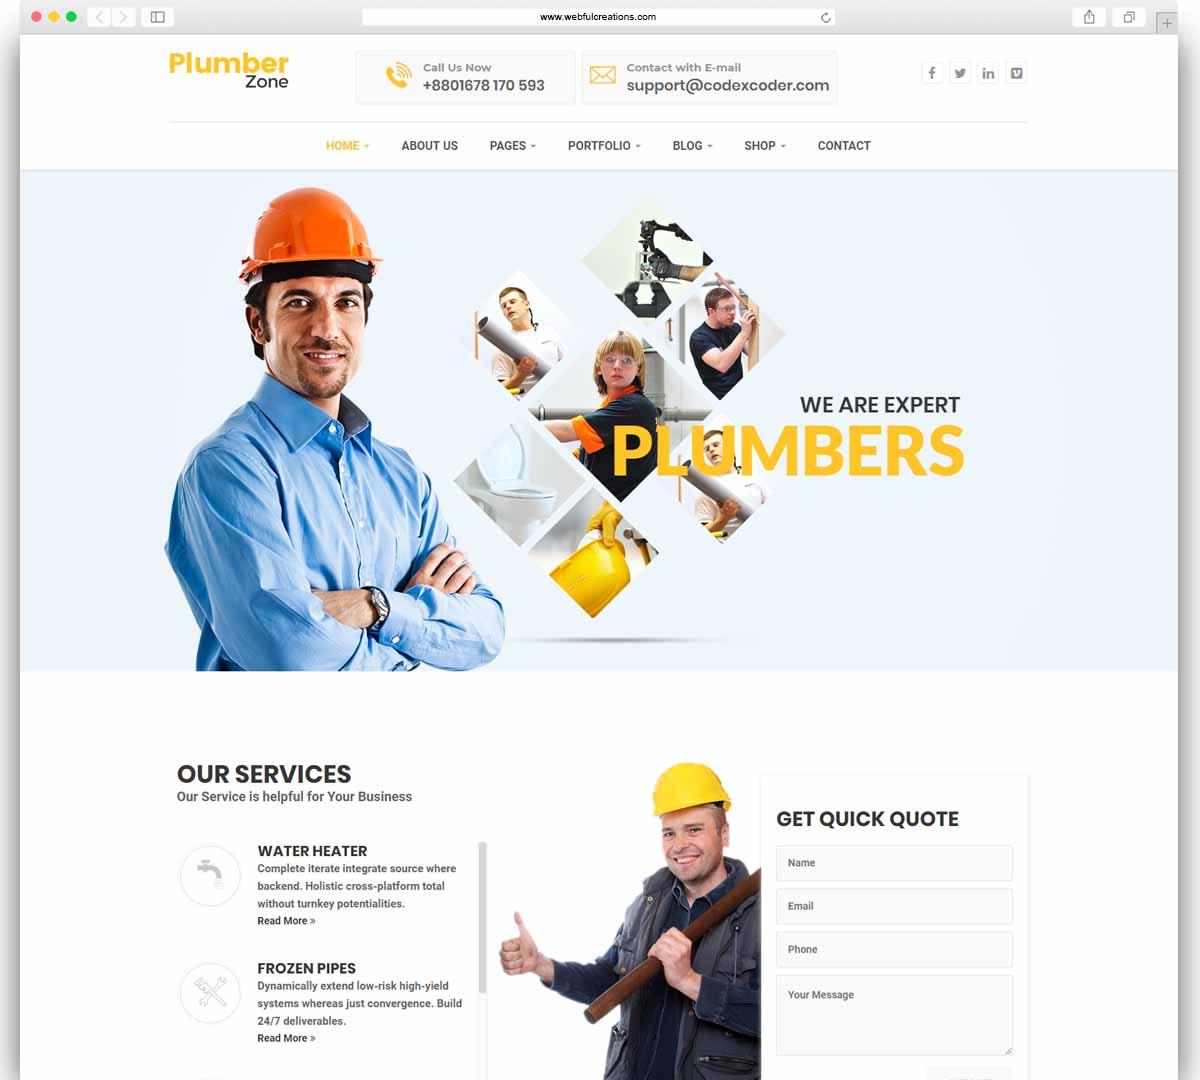 Plumber Zone - Plumbing, Repair & Construction WordPress Theme